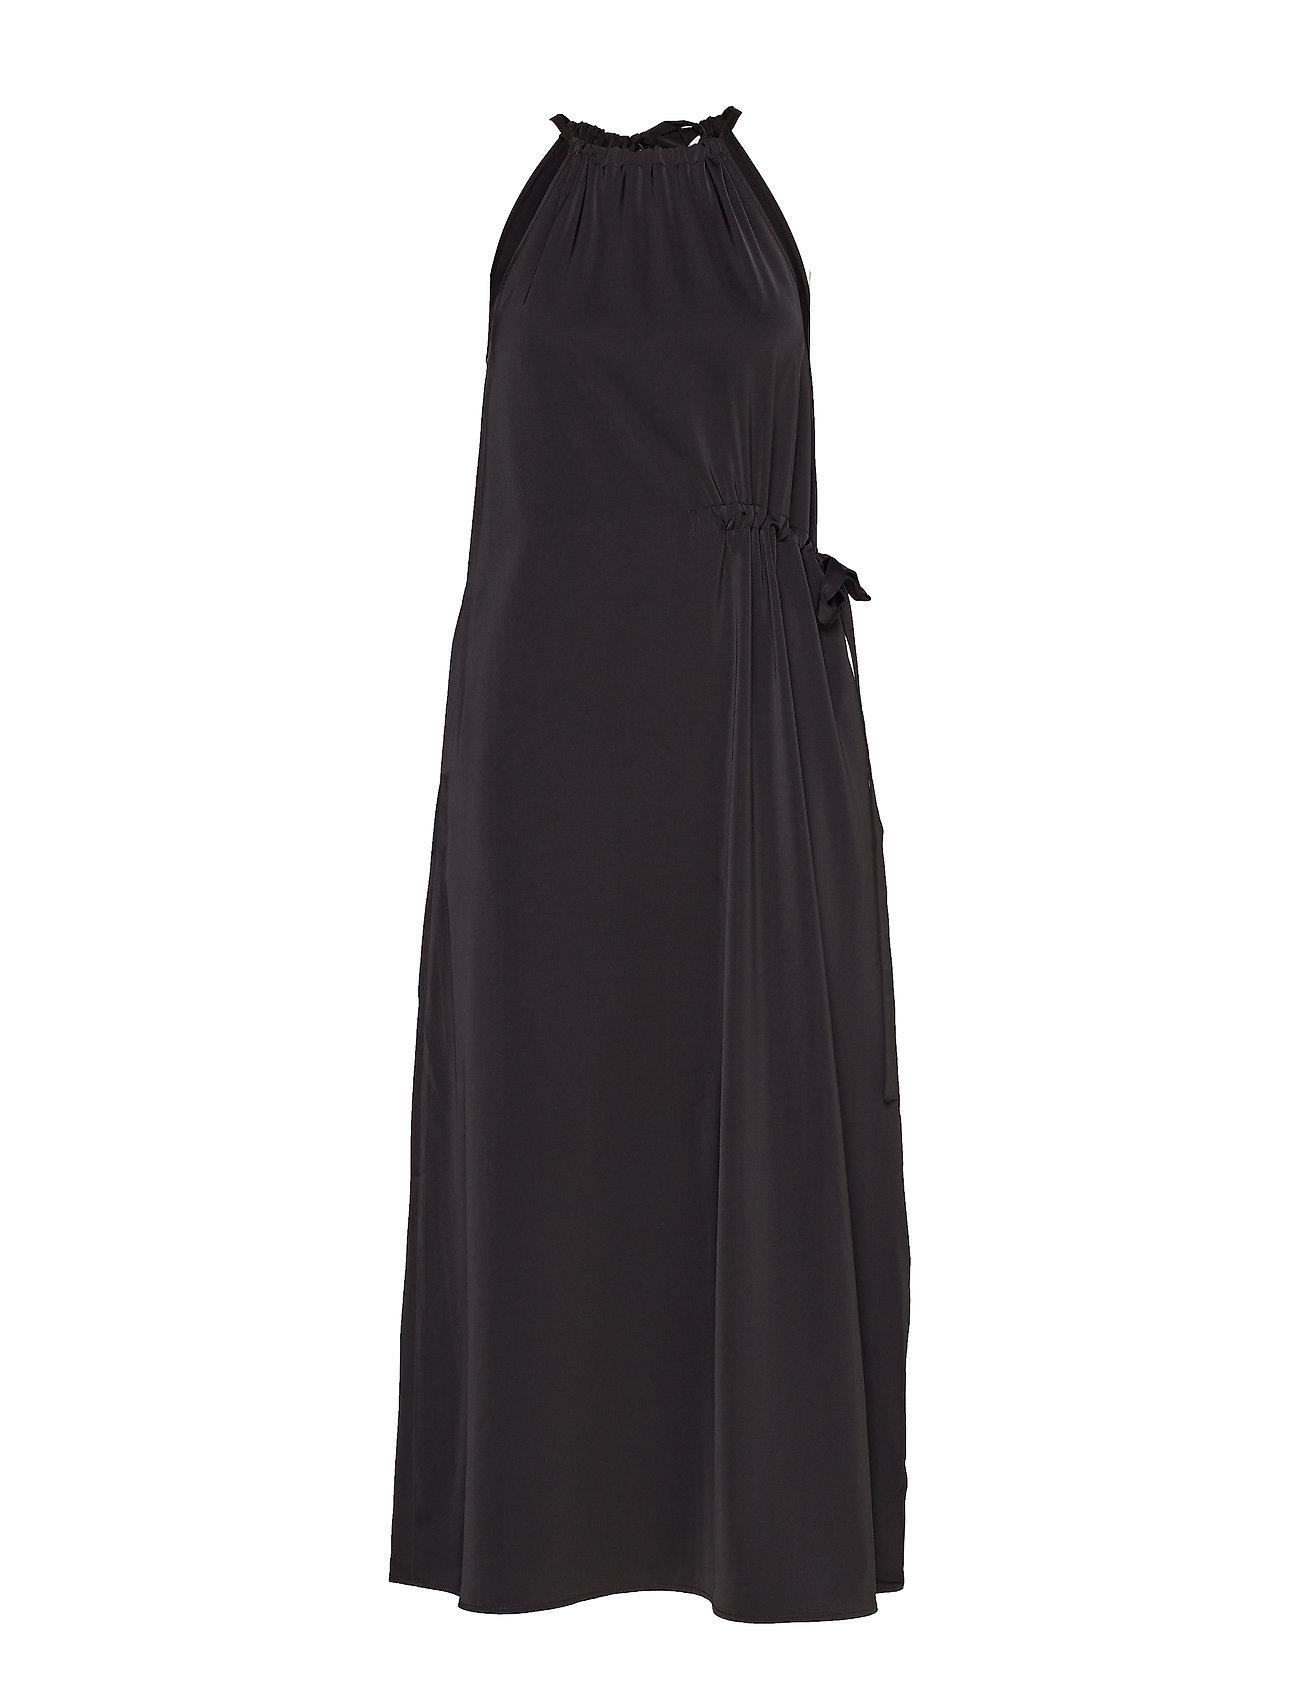 In WDrawstring Dress SideblackCoster The Copenhagen b7yYgf6v